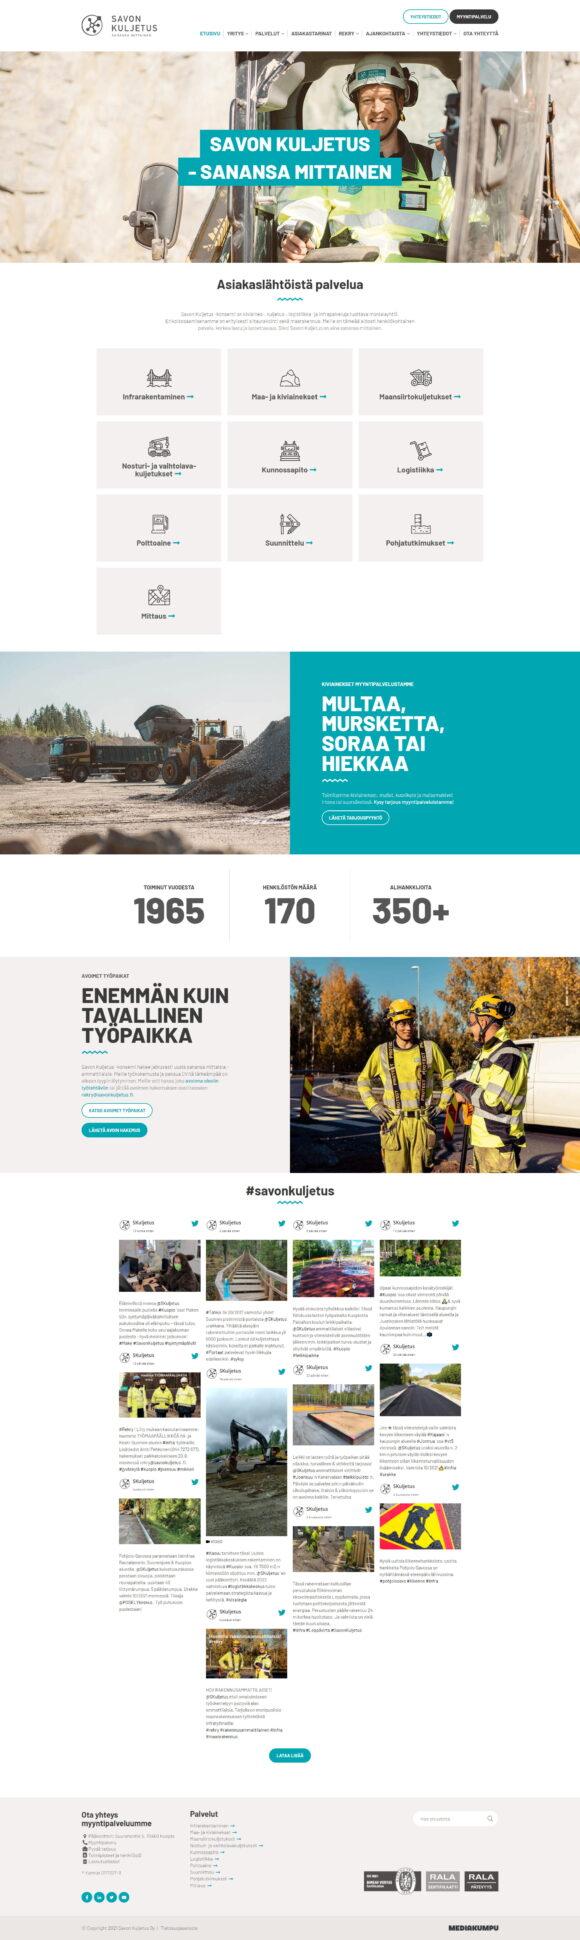 WordPress-kotisivut: Savon Kuljetus, etusivu - Mediakumpu